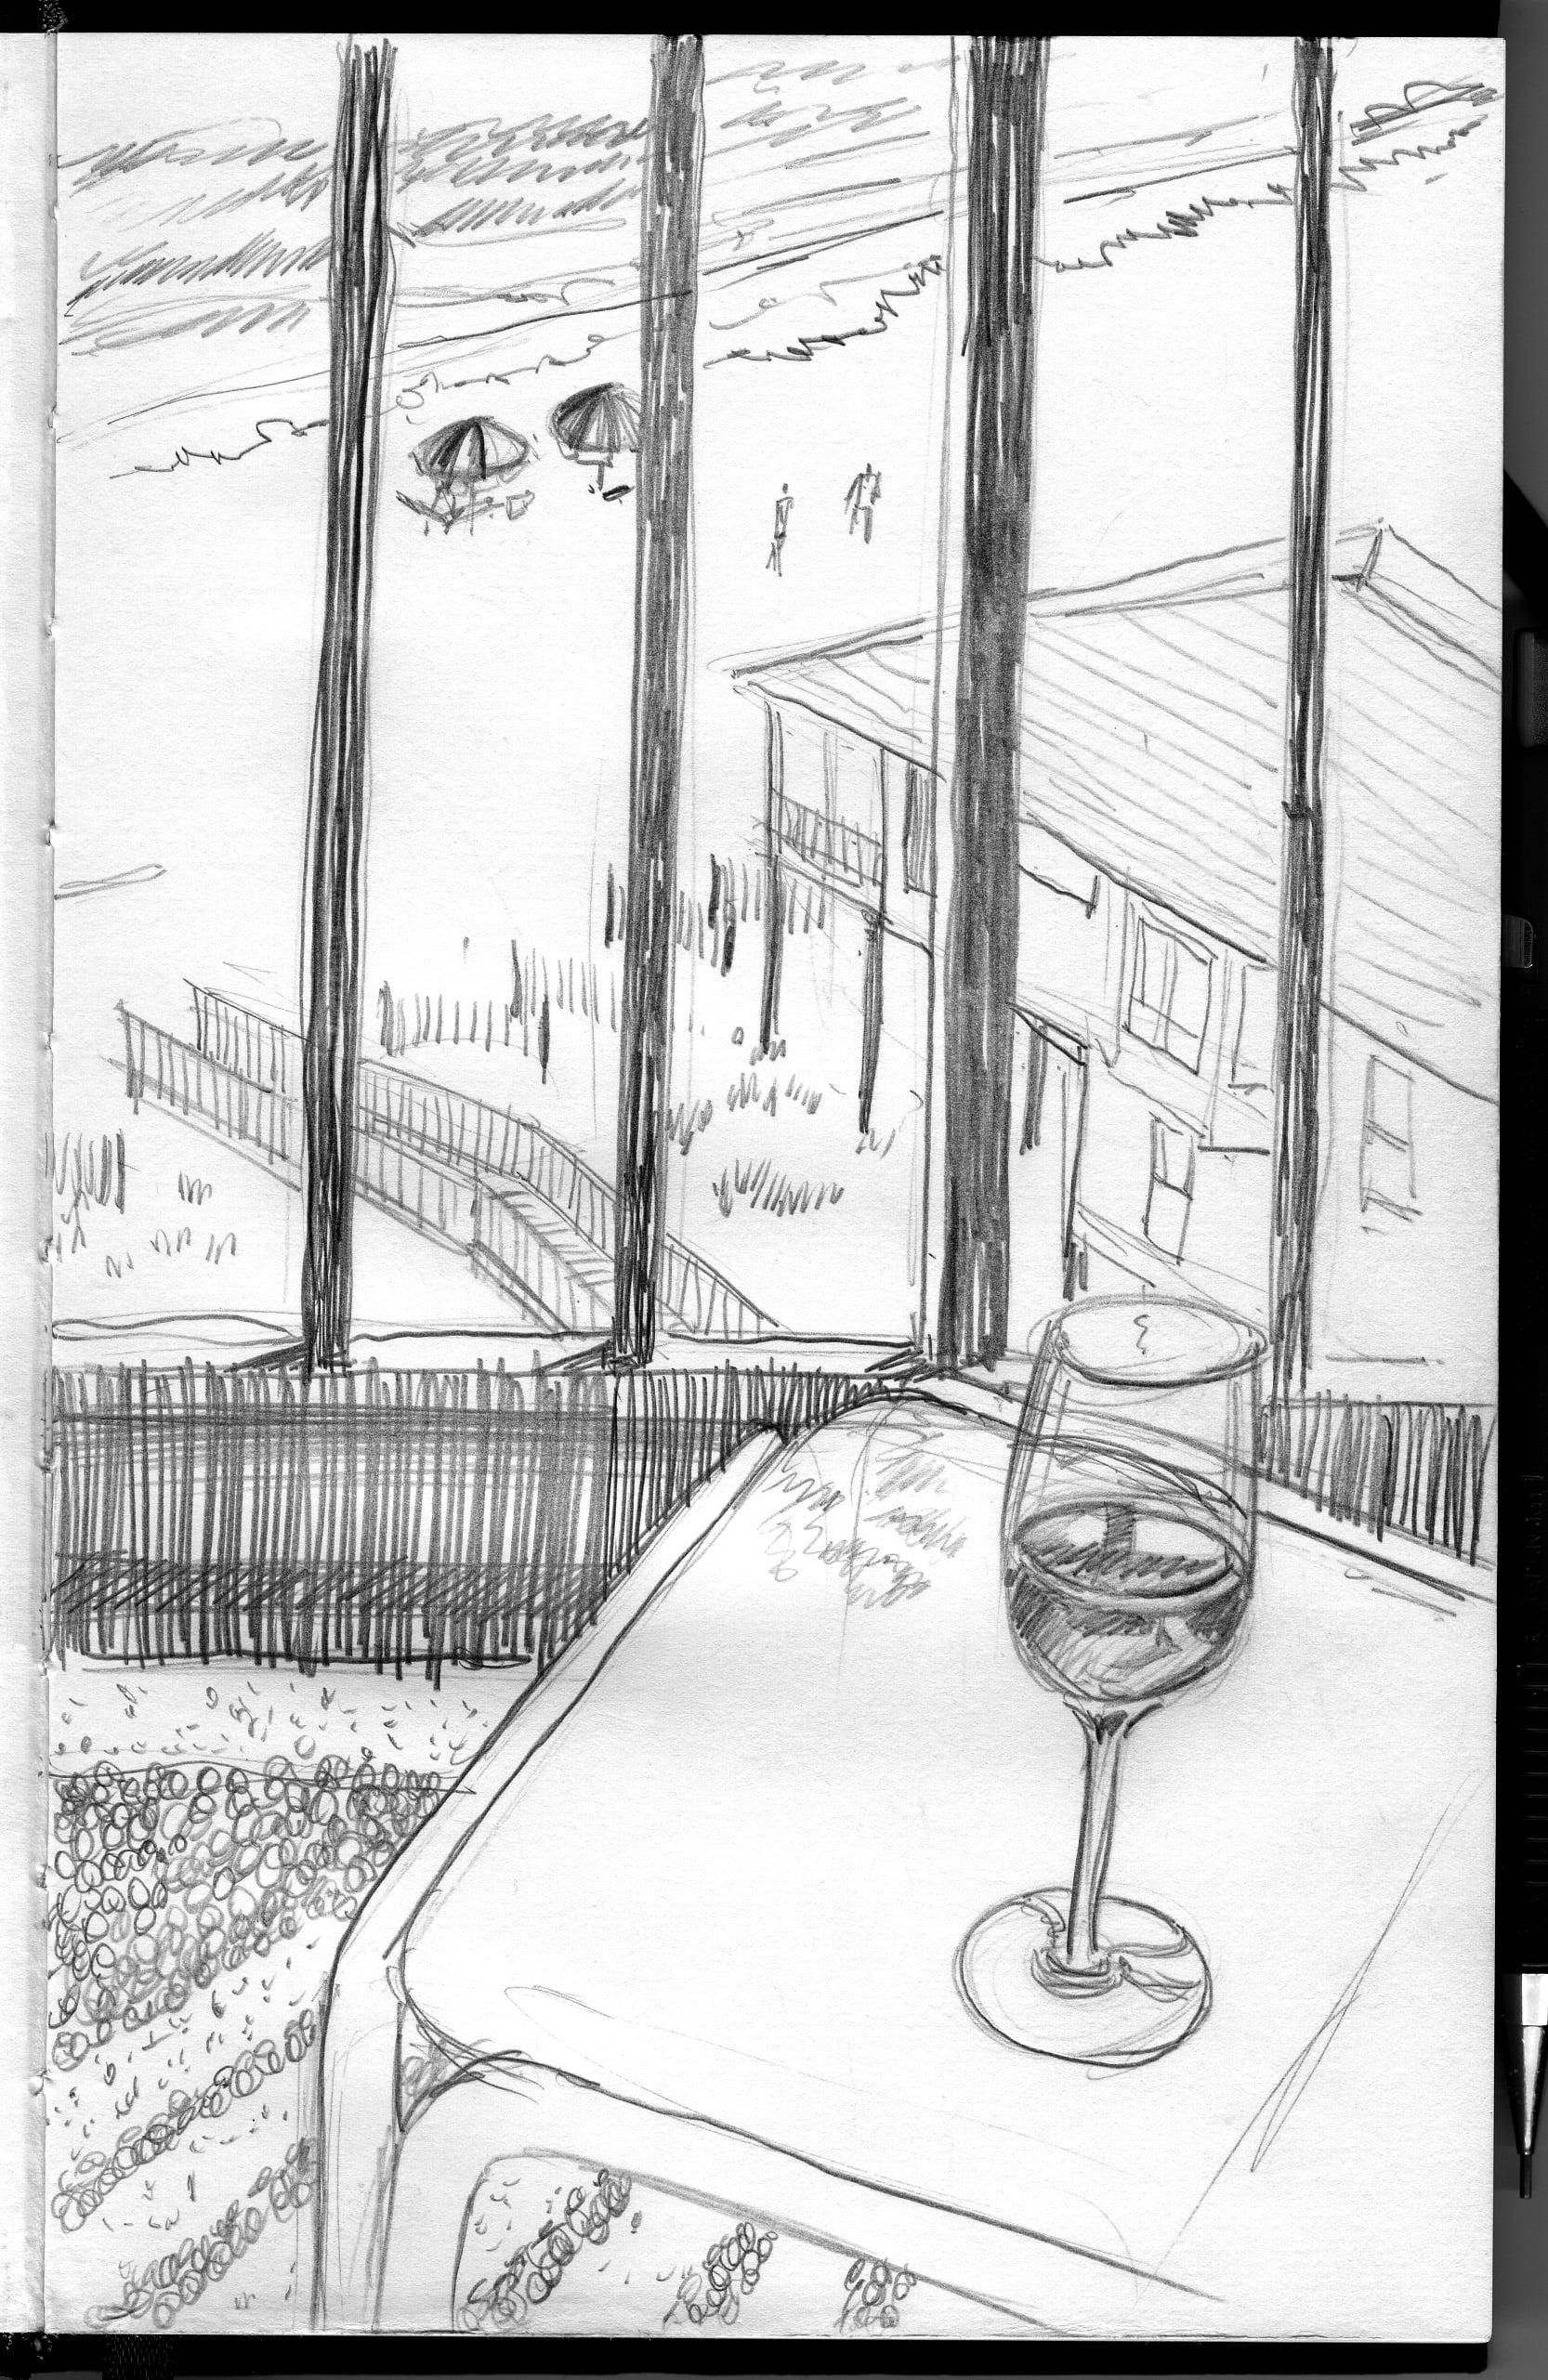 Destin patio 2011.jpg